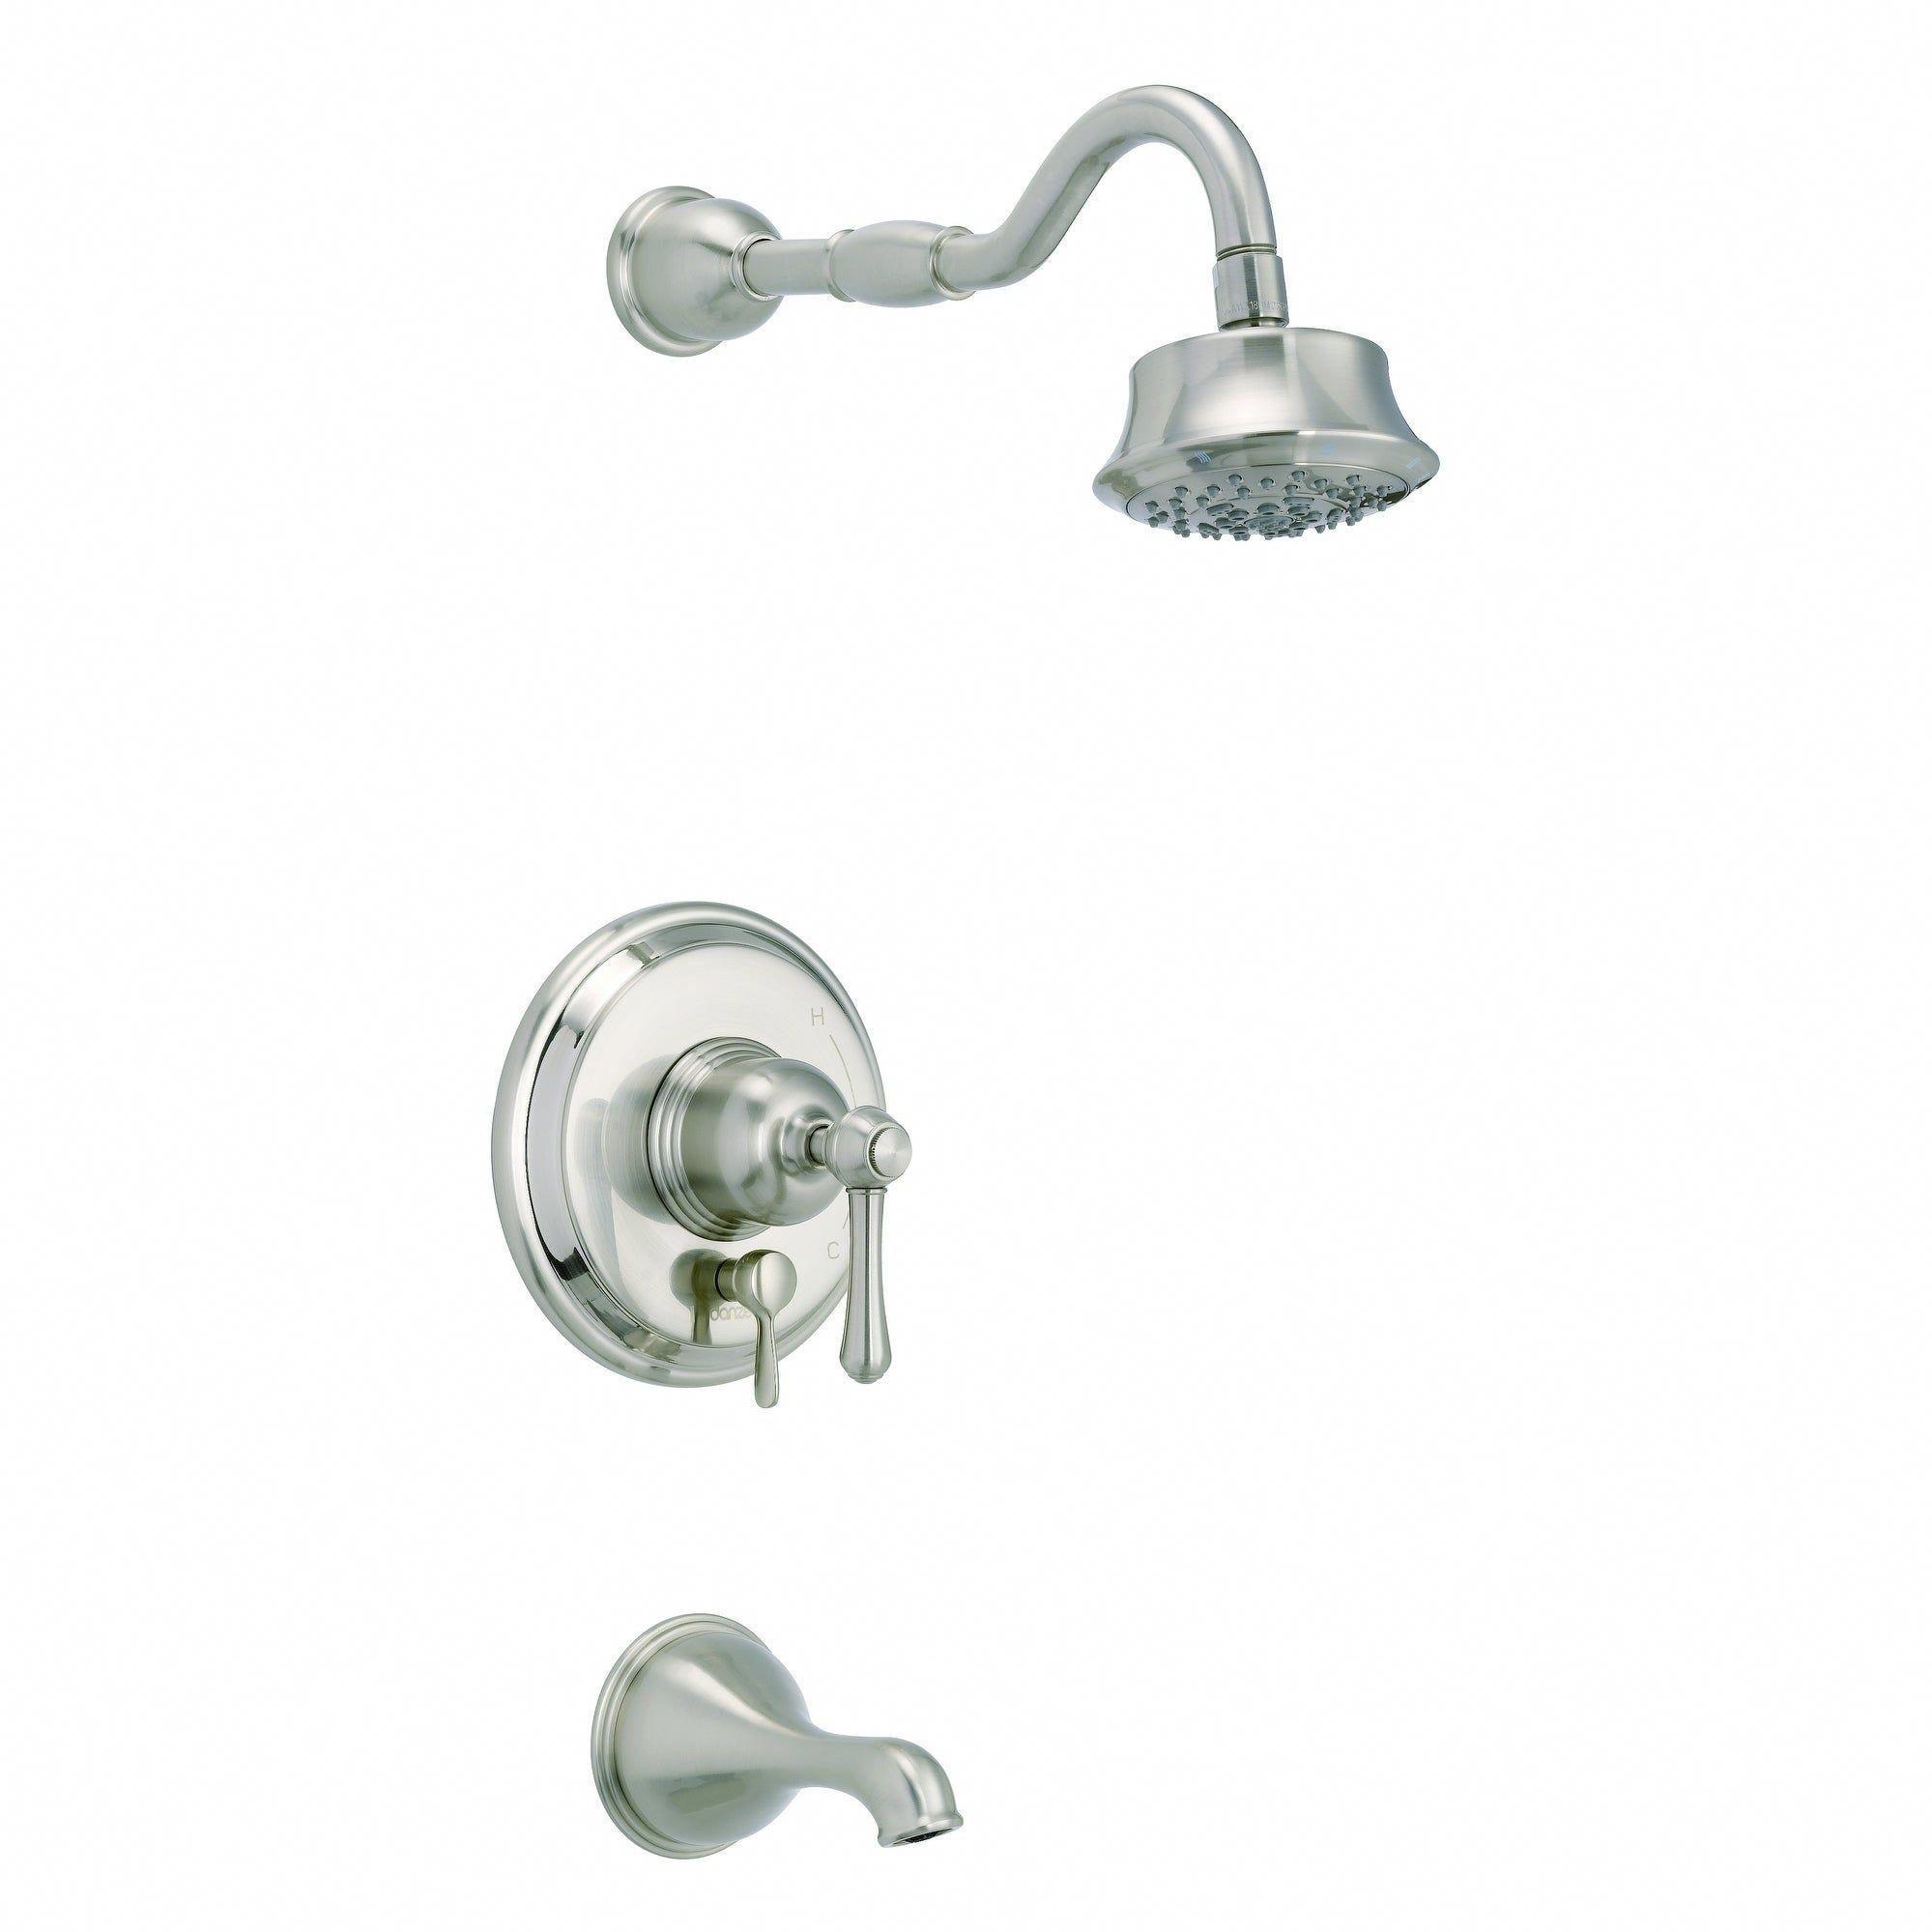 Opulence 1h Tub Shower Trim Kit Treysta Cartridge W Diverter On Valve 5 Function Showerhead 2 0gpm Brushe In 2020 Shower Tub Tub And Shower Faucets Shower Heads